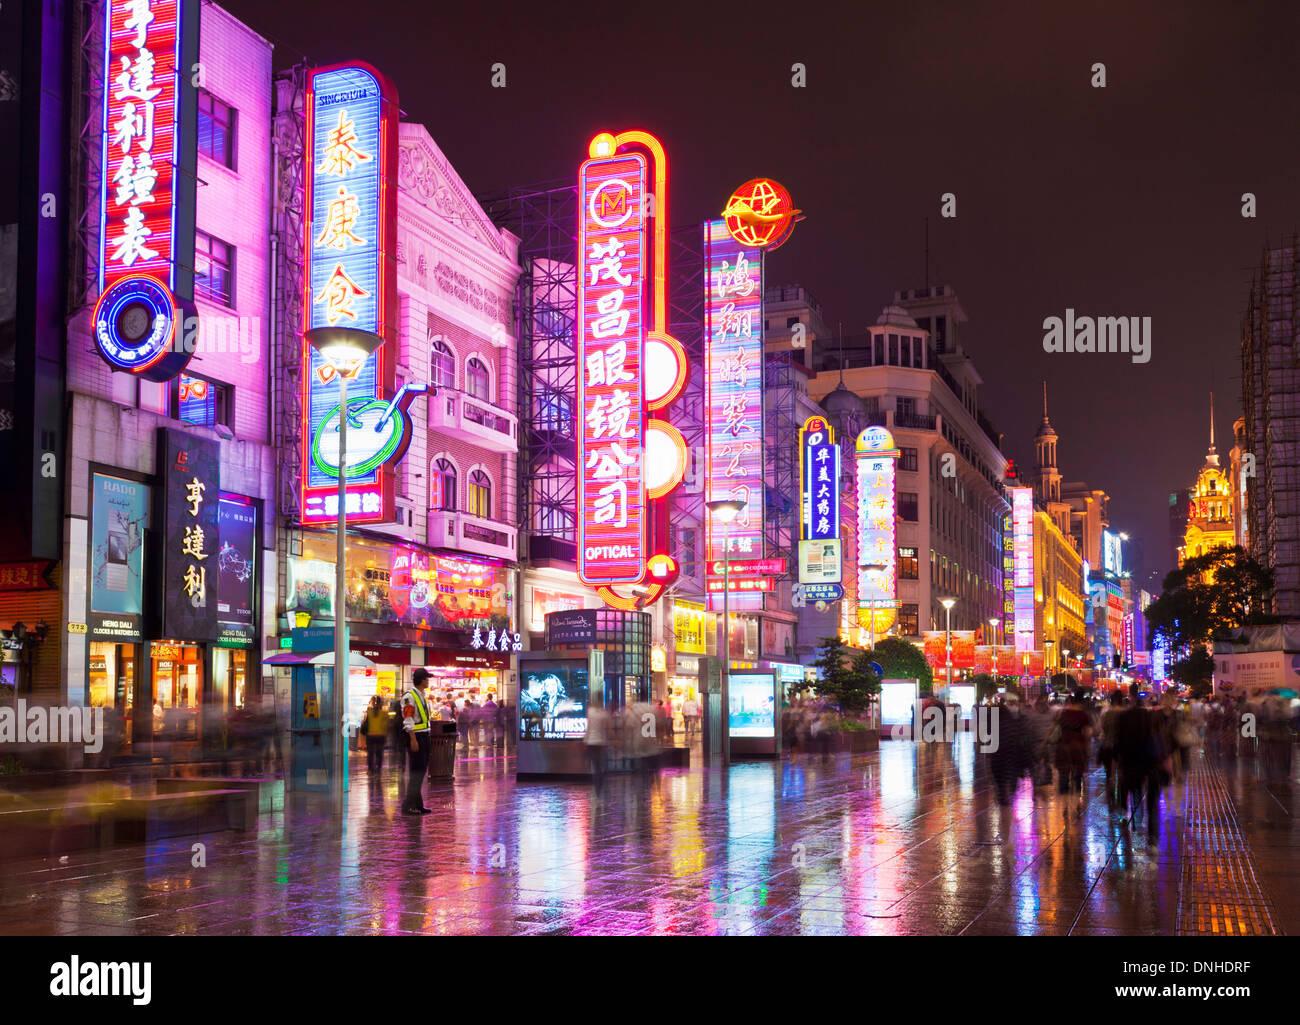 Nanjing Road East shopping street, Shanghai street city center Repubblica Popolare Cinese, PRC, Asia Immagini Stock